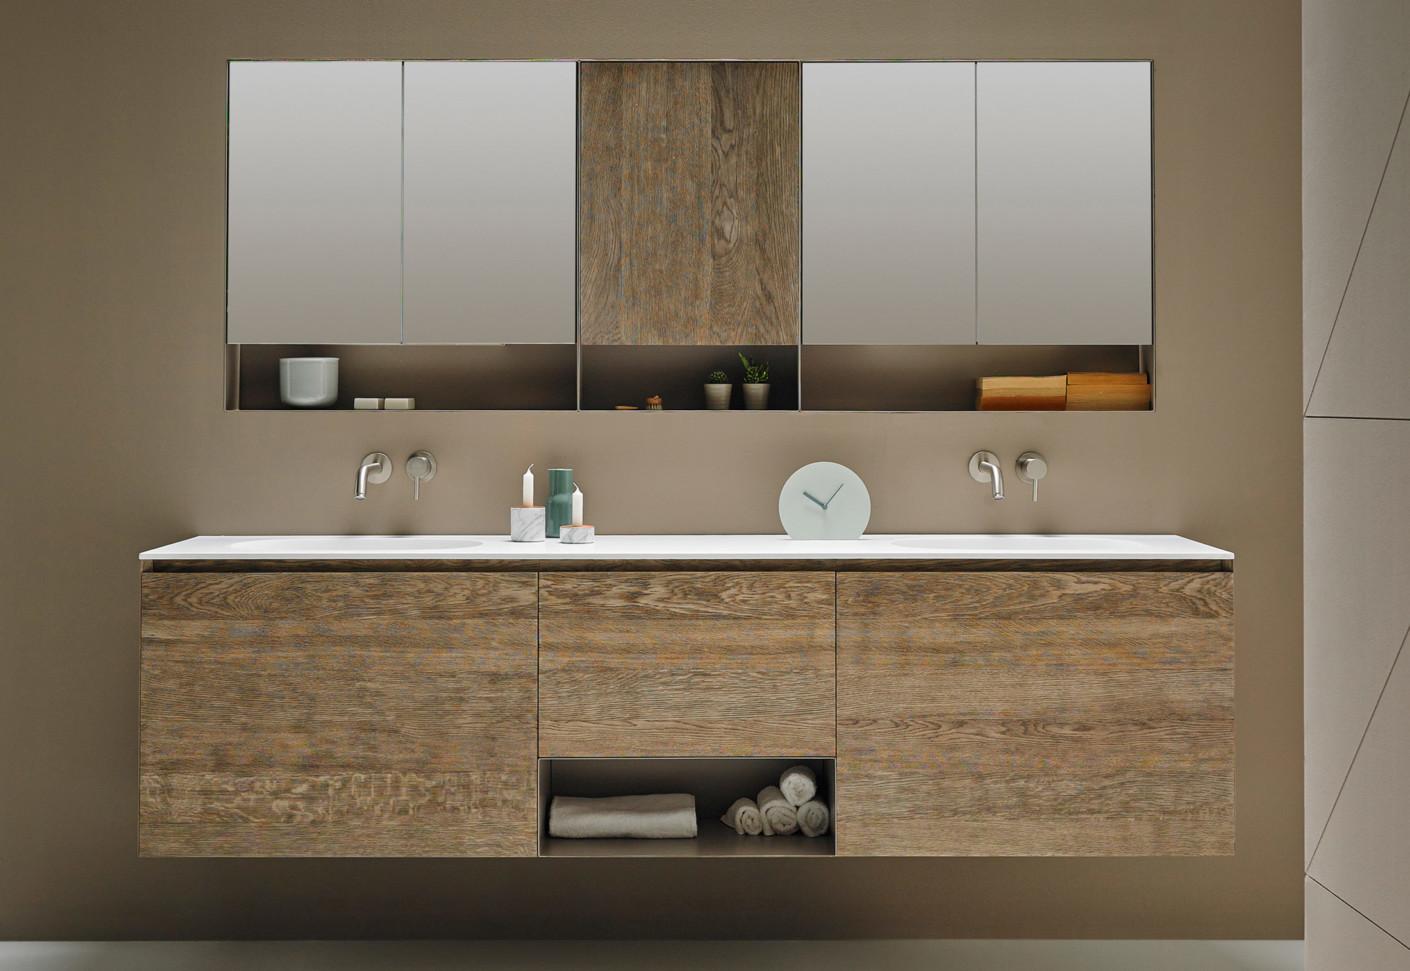 Strato bathroom furniture set 8 by inbani stylepark for Bathroom furniture sets